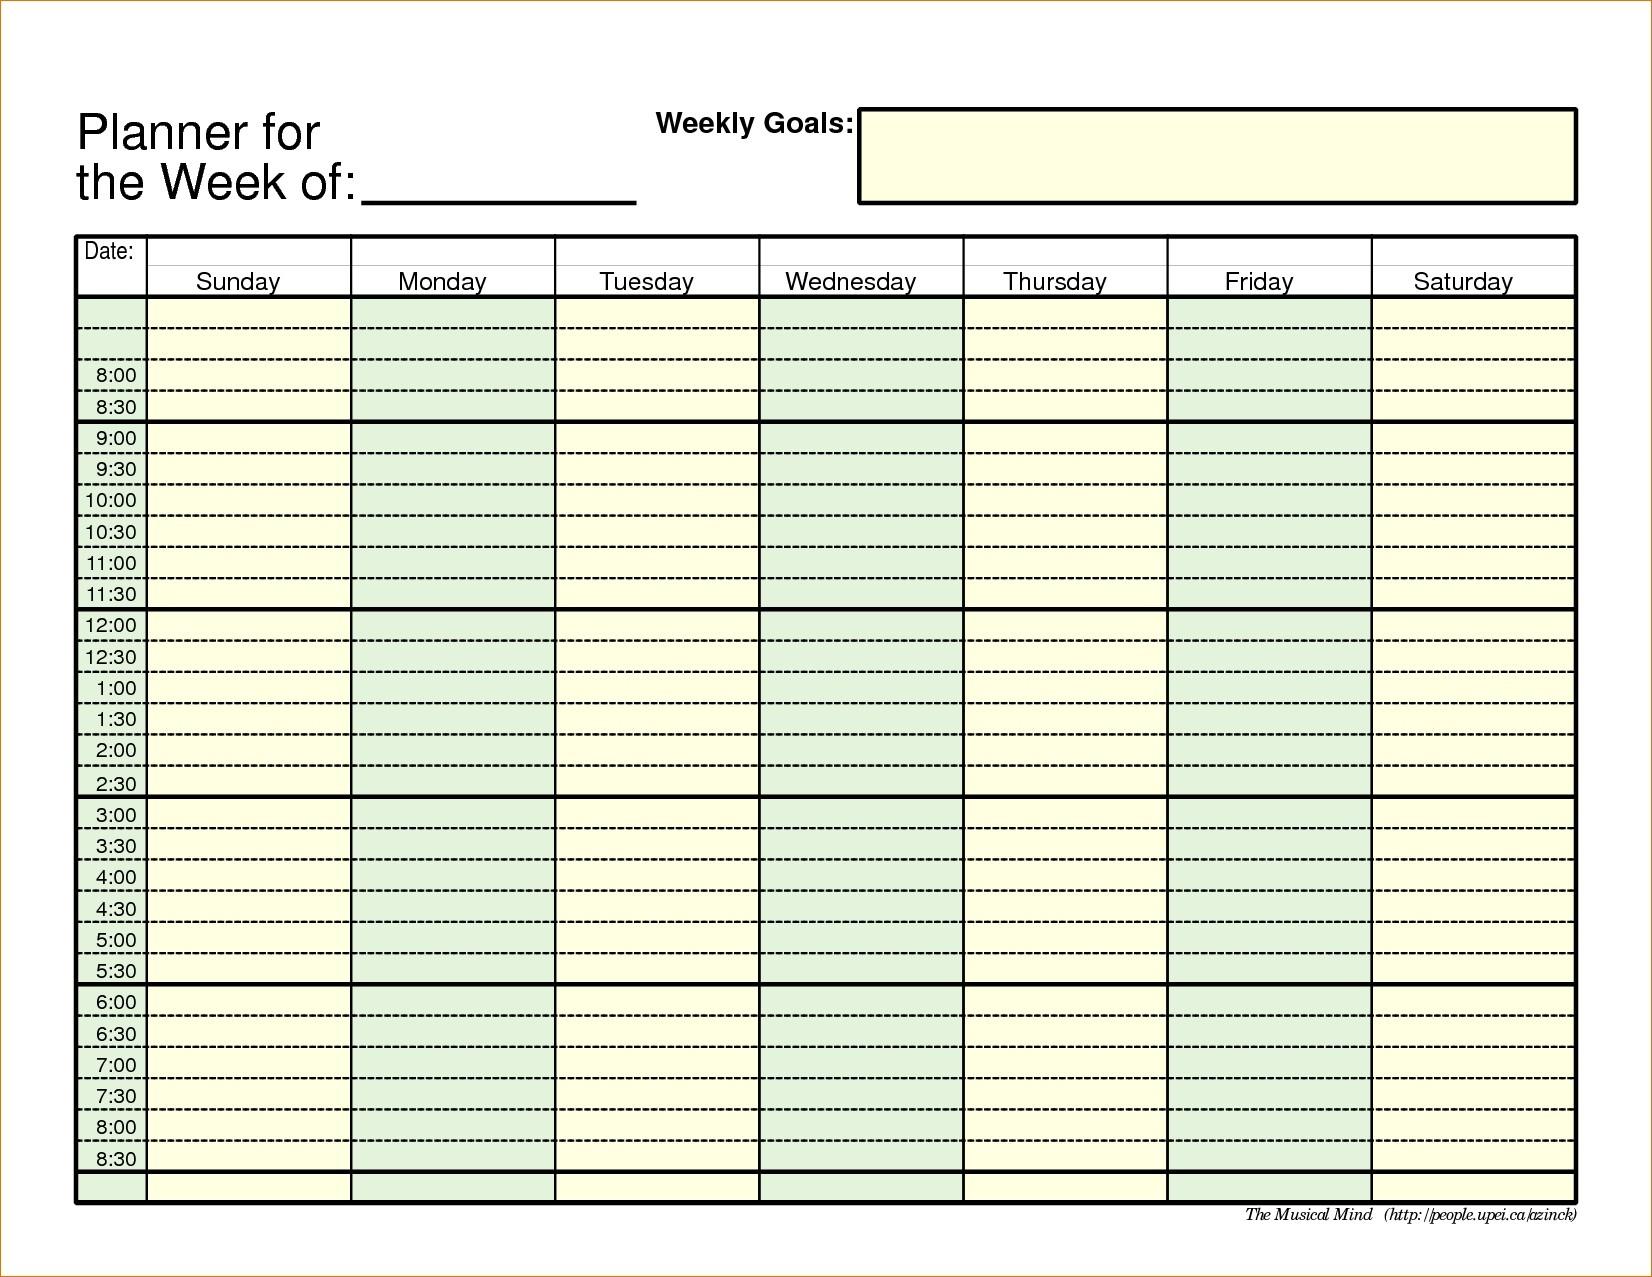 5 Day Calendar Template 6584253 Within 5 Day Calendar Template Excel inside 5 Day Calendar Template Word